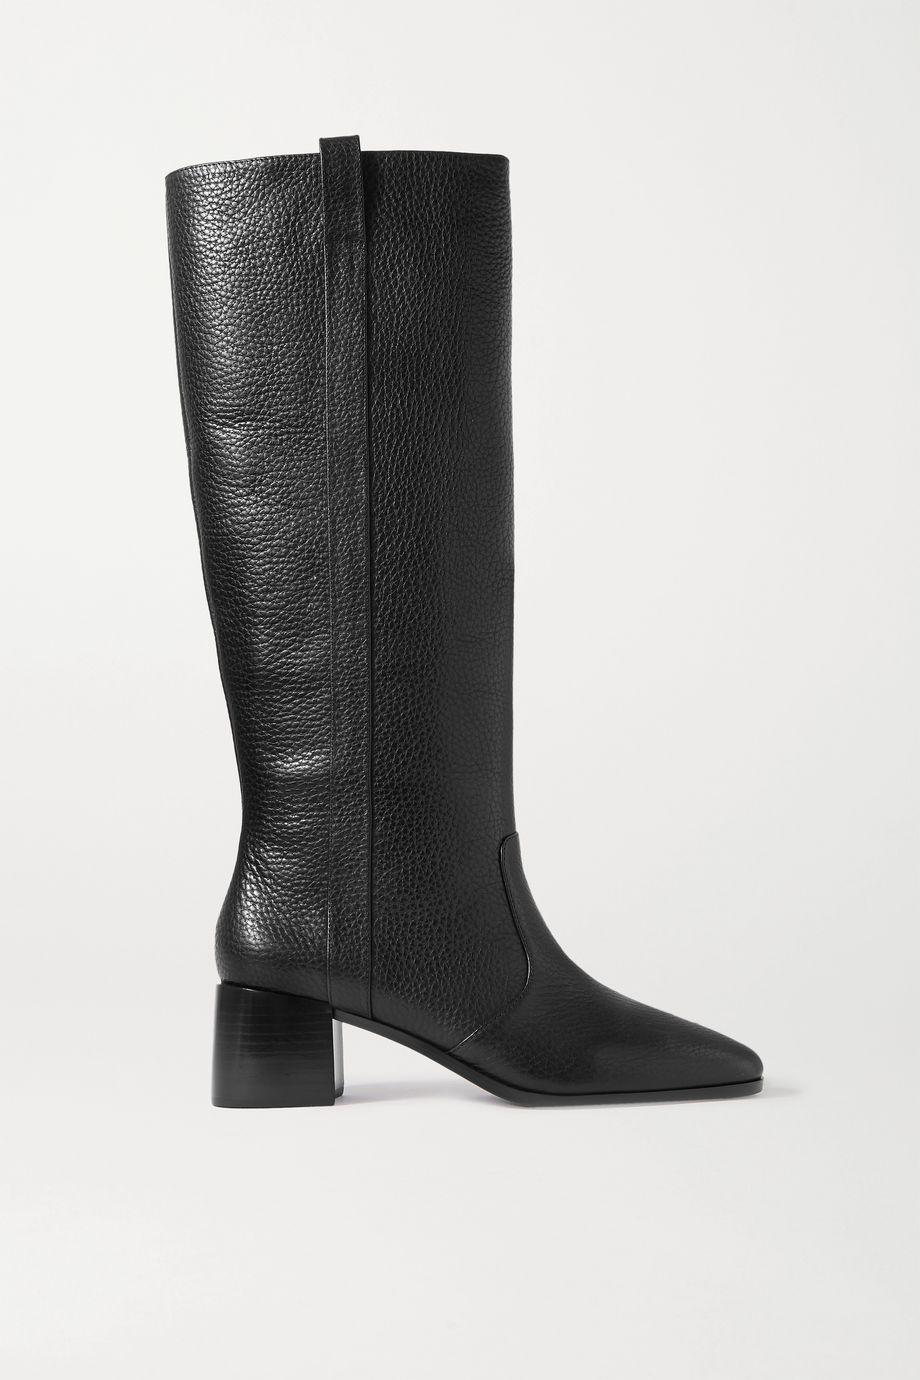 Loeffler Randall Ryan textured-leather knee boots